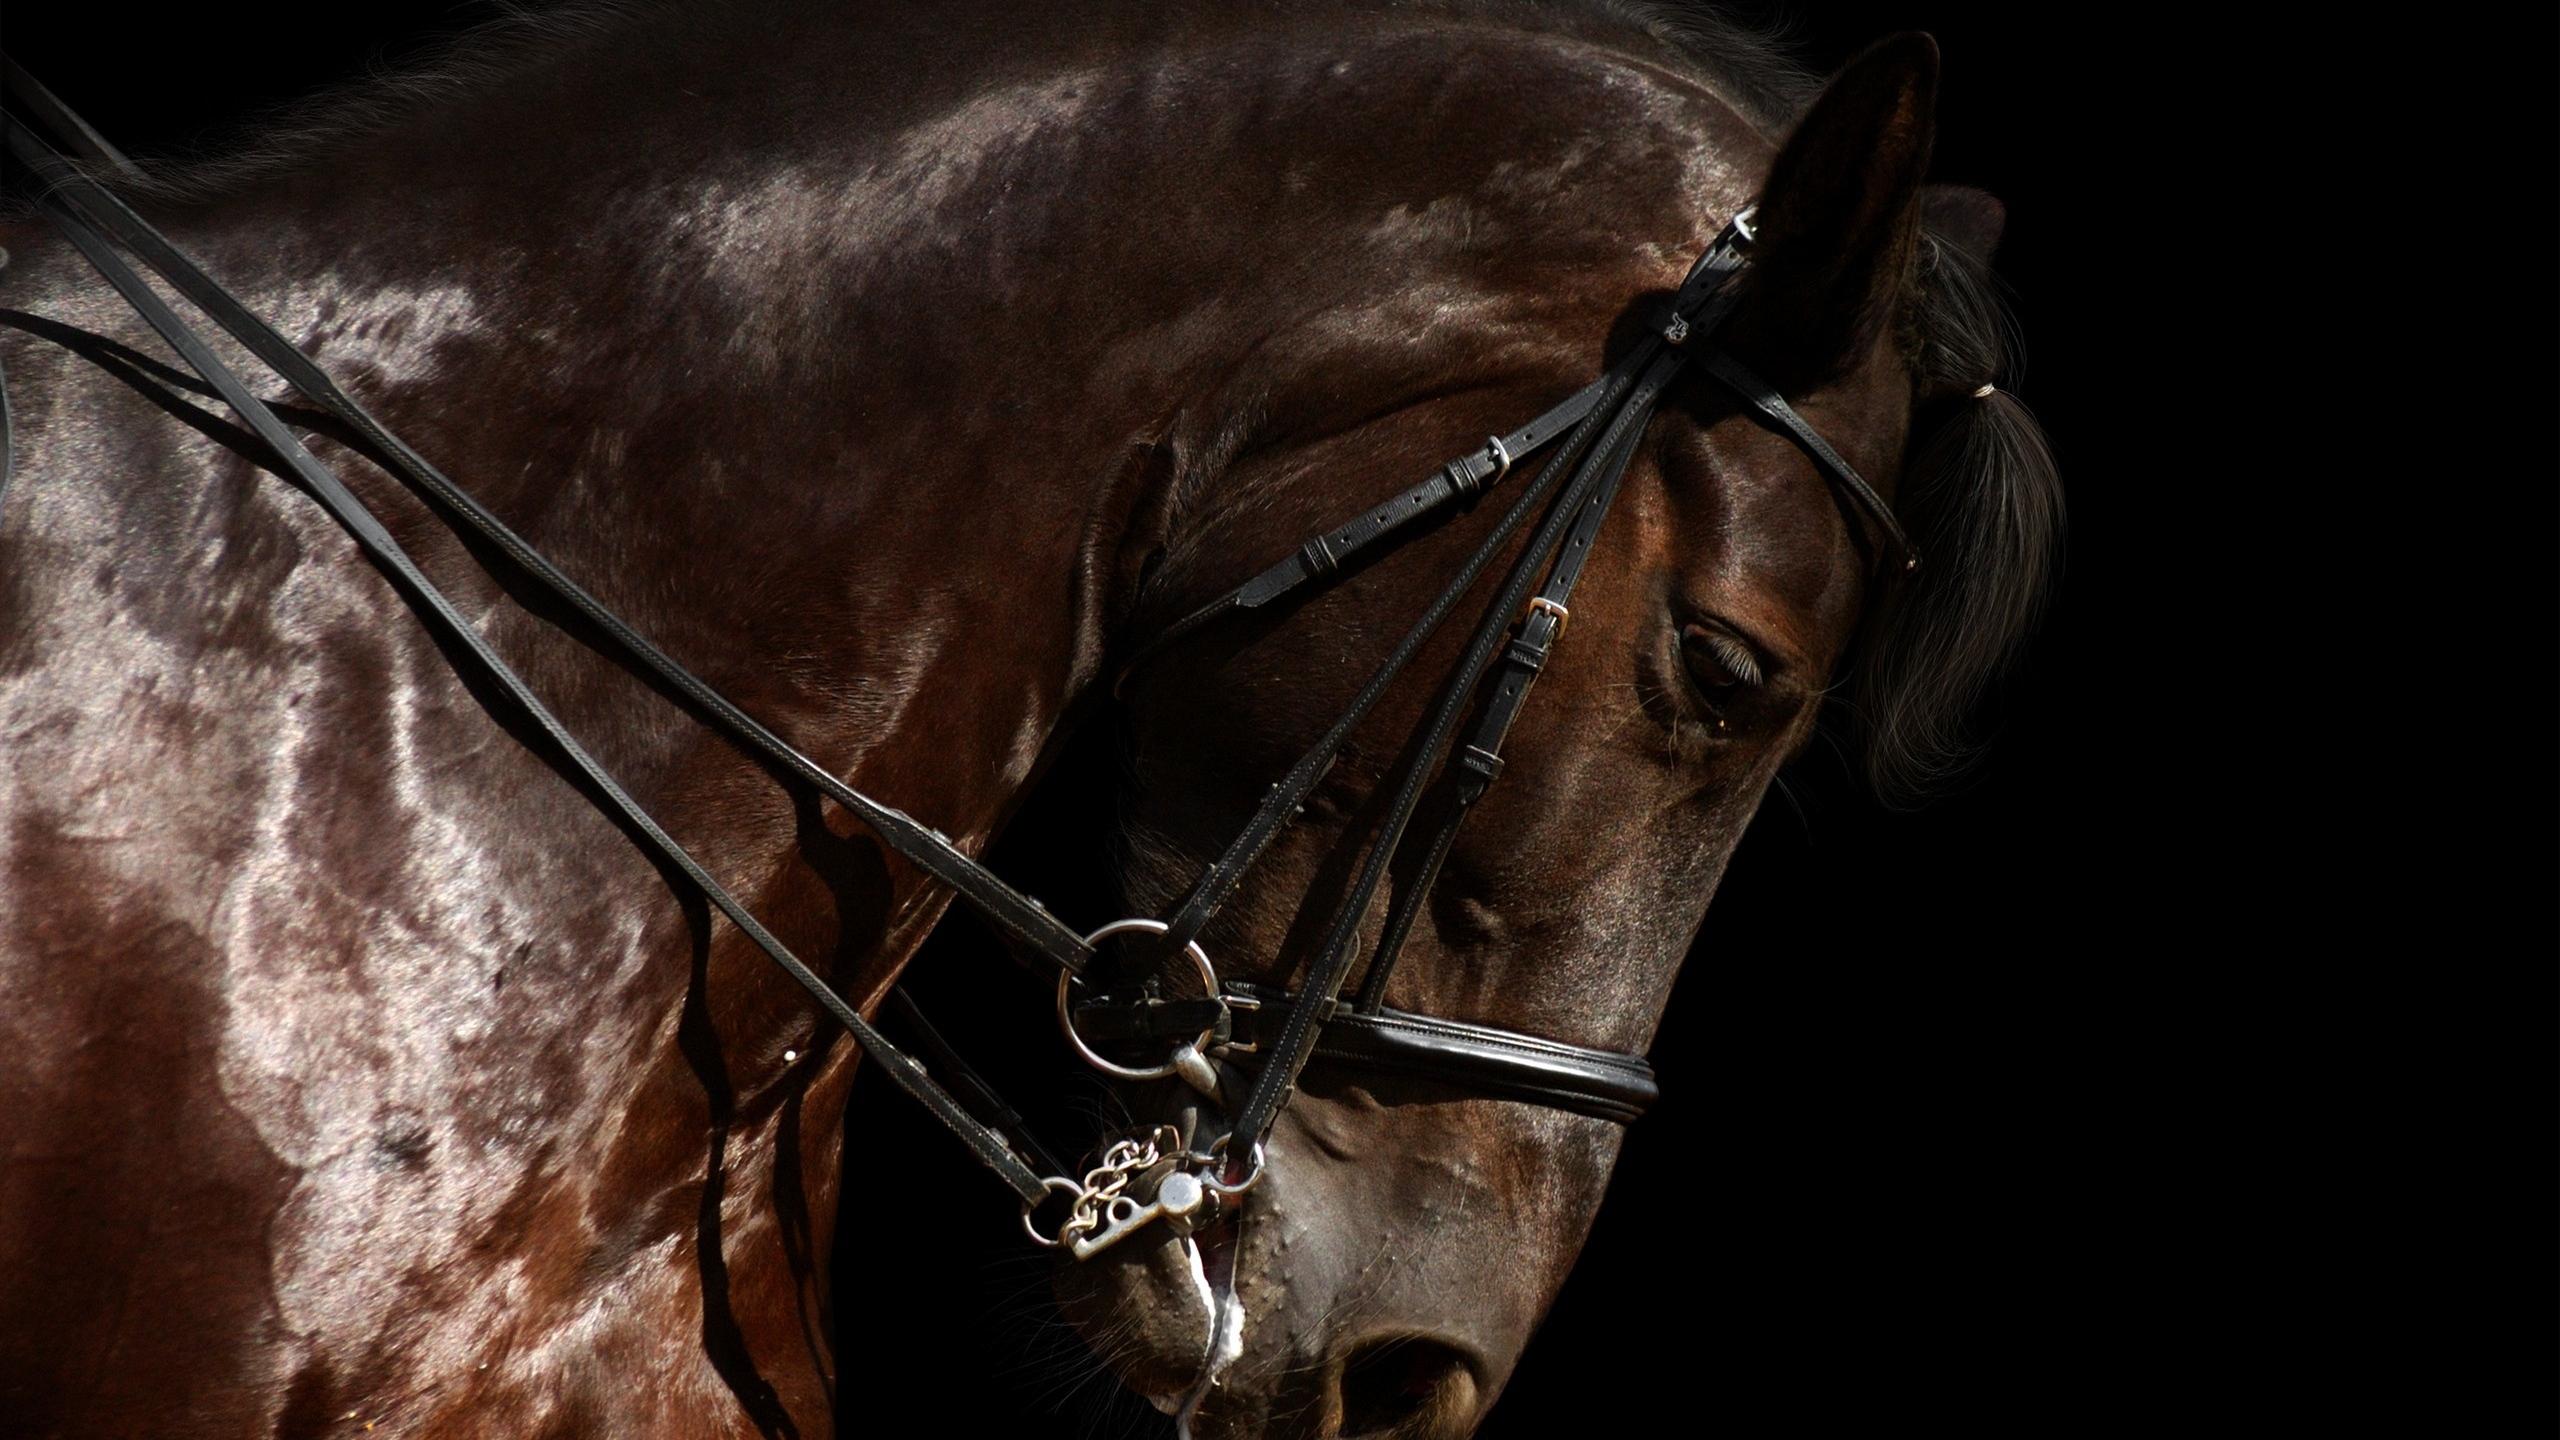 Horse Close Up Photography - Hd Desktop Wallpapers  4K Hd-4858